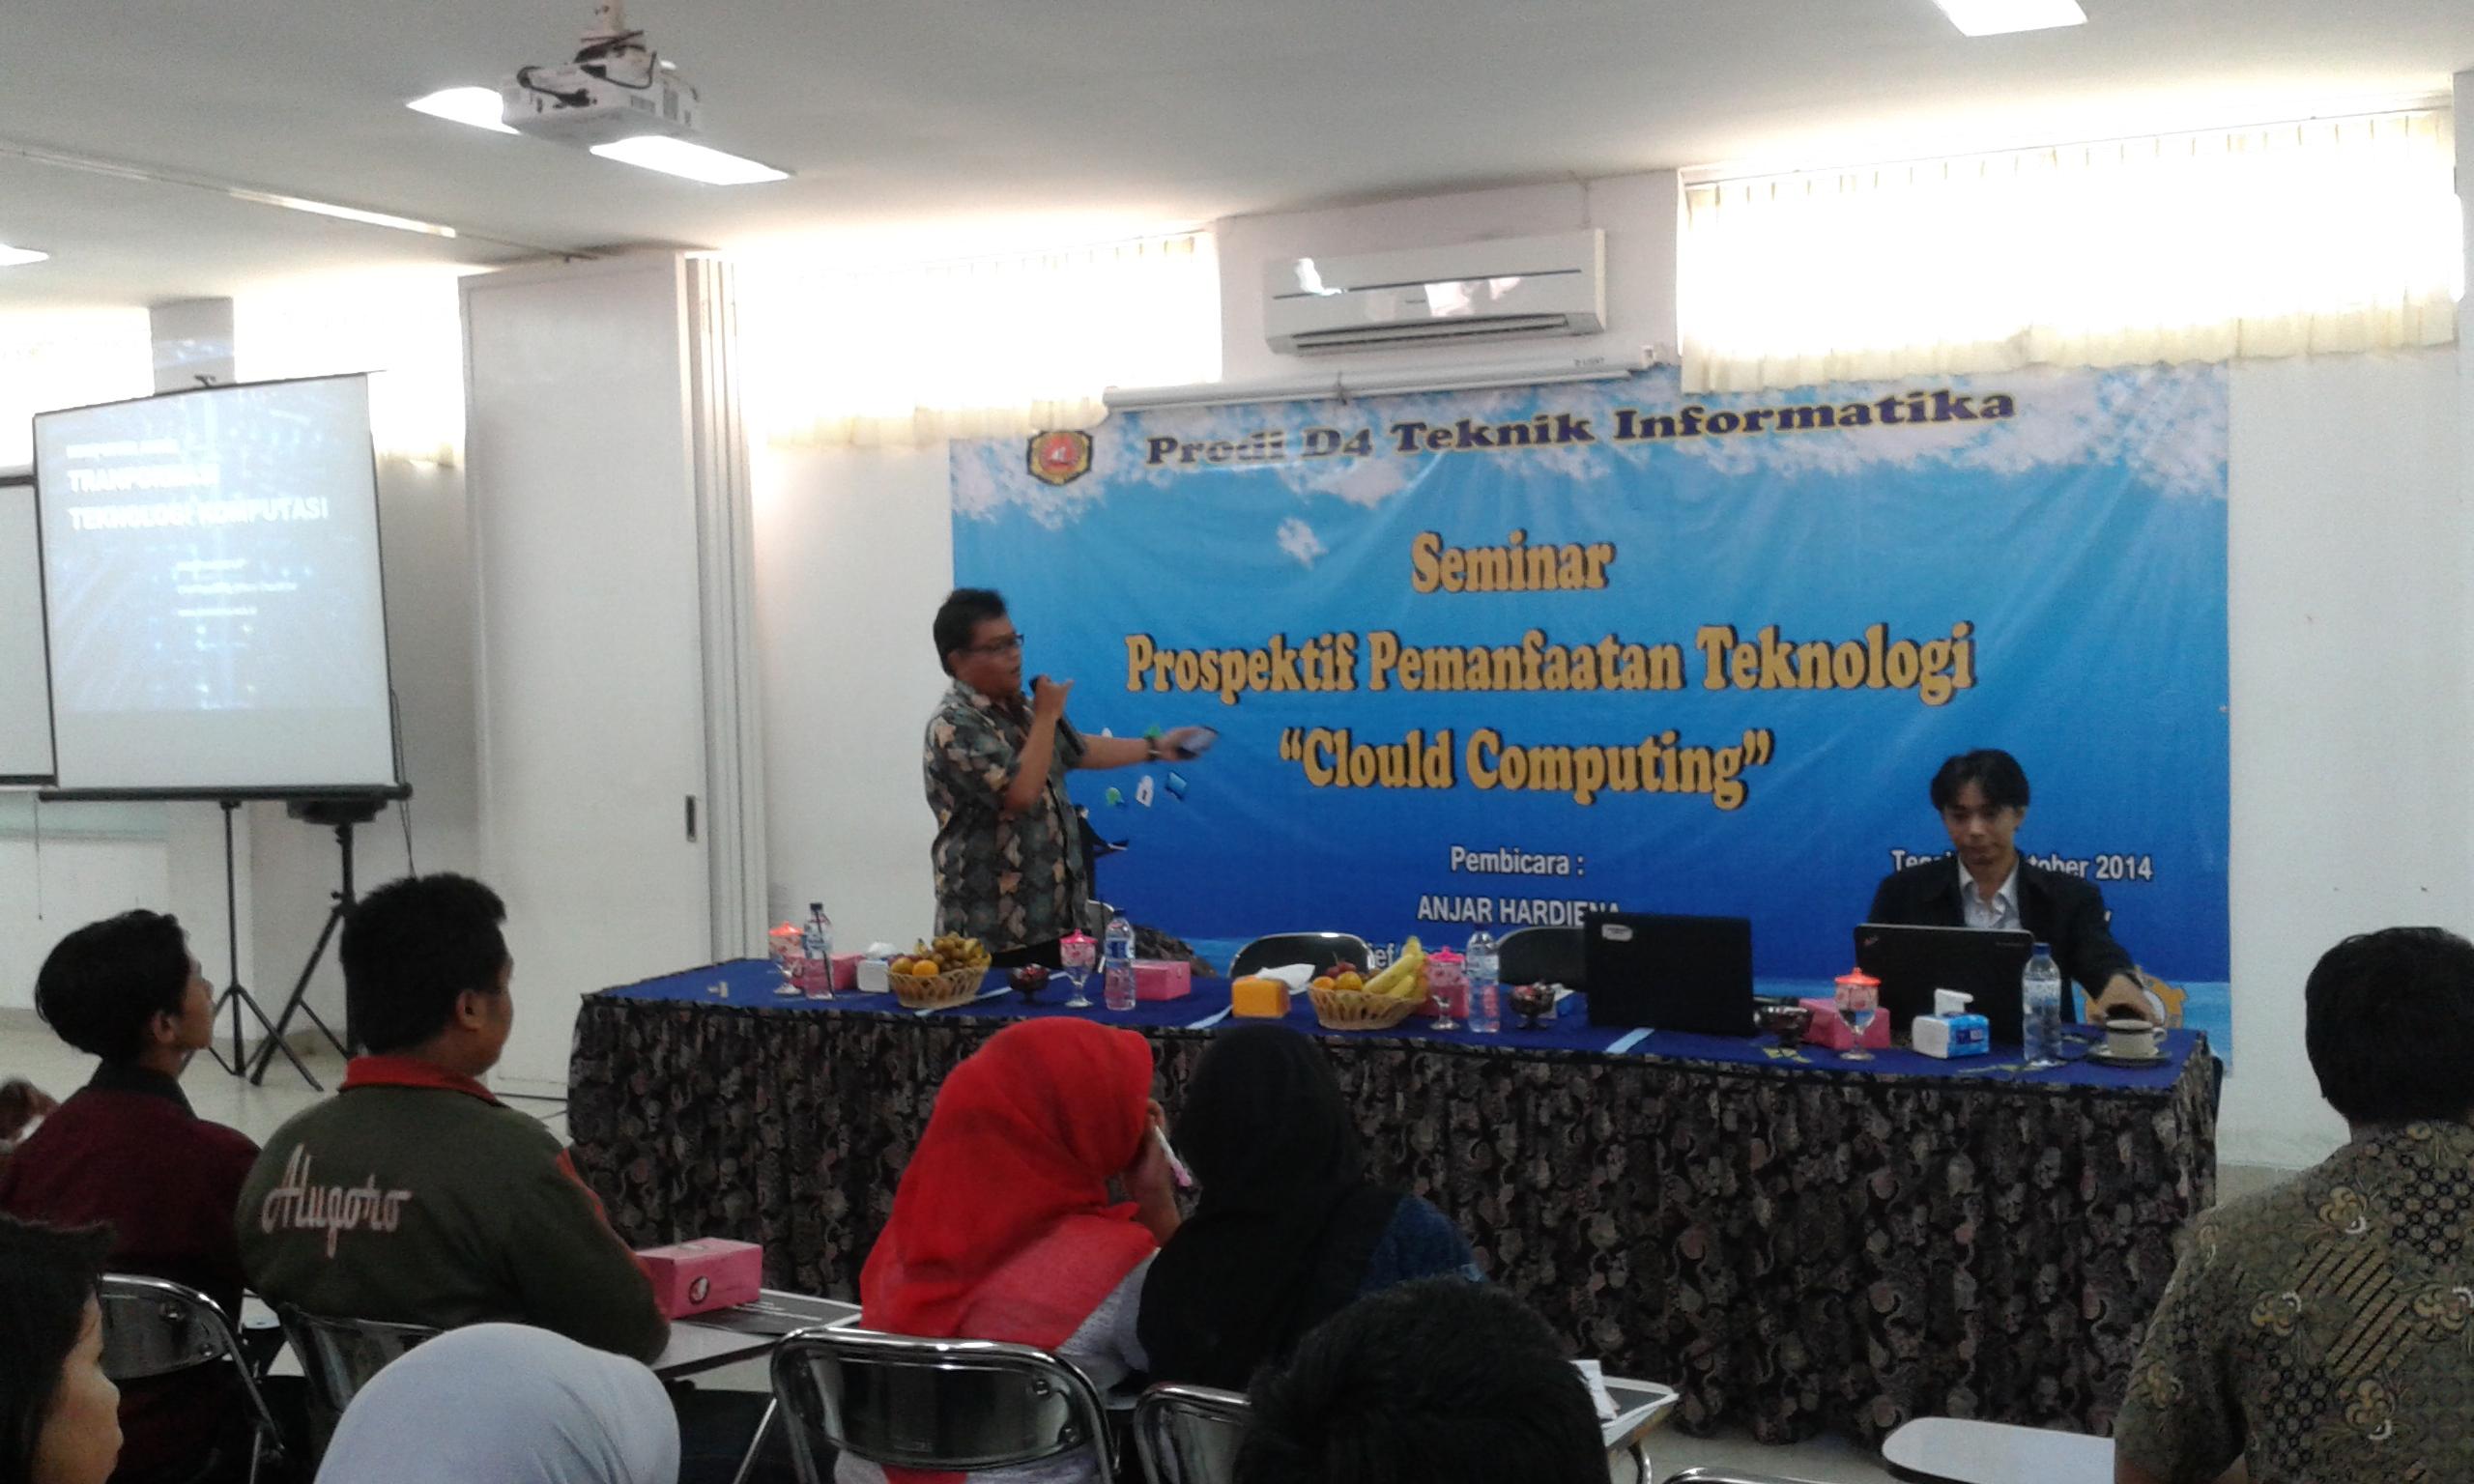 Seminar Teknologi - Cloud Computing D4 Teknik Informatika